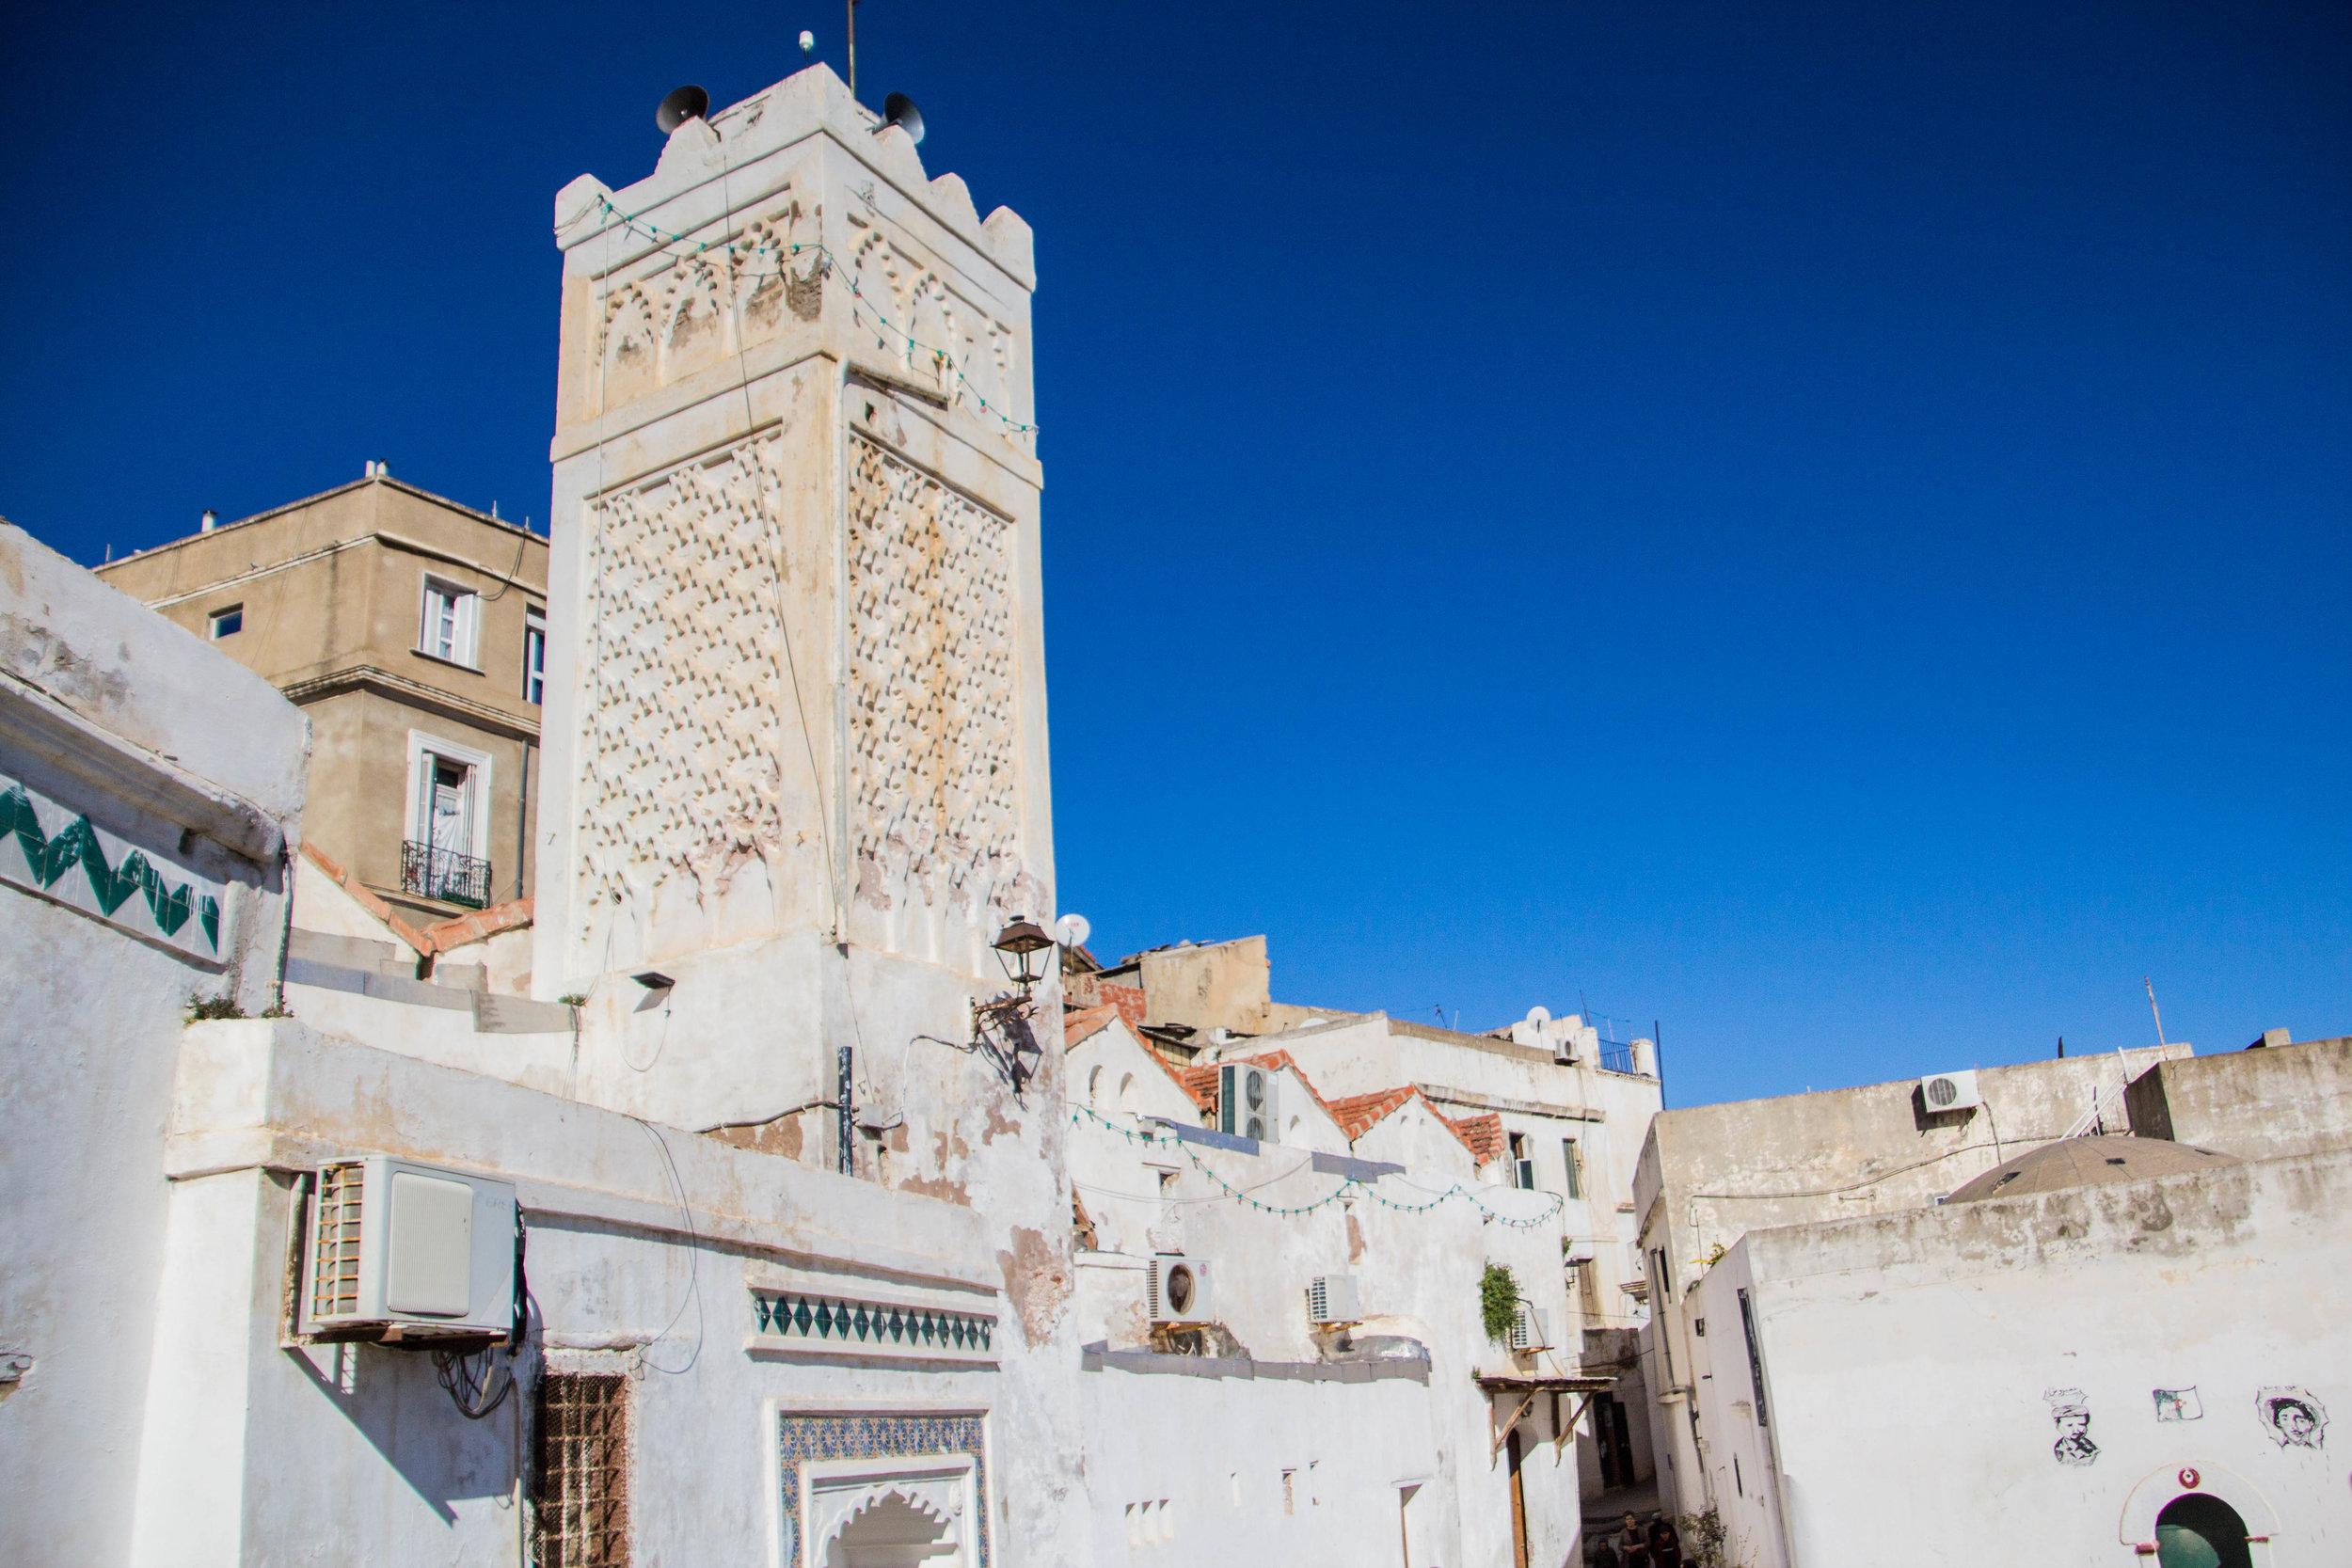 casbah-photography-algiers-algeria-alger-42.jpg